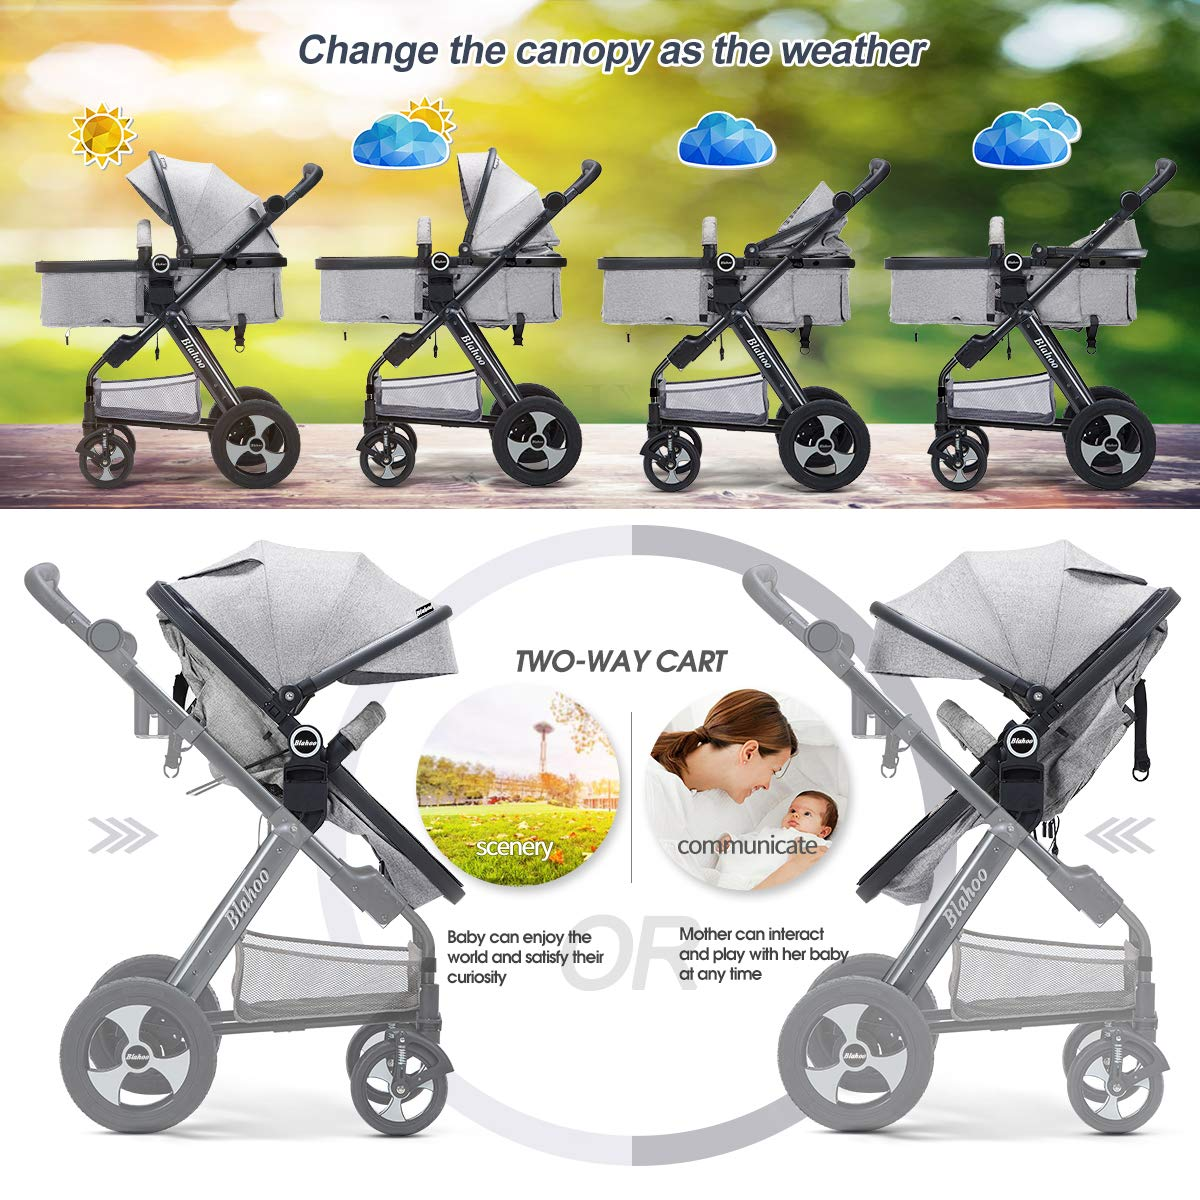 Blahoo Compact Stroller Organizer Bassinet Stroller Lightweight for Toddler Reversible with Cup Holder 8002BLUE